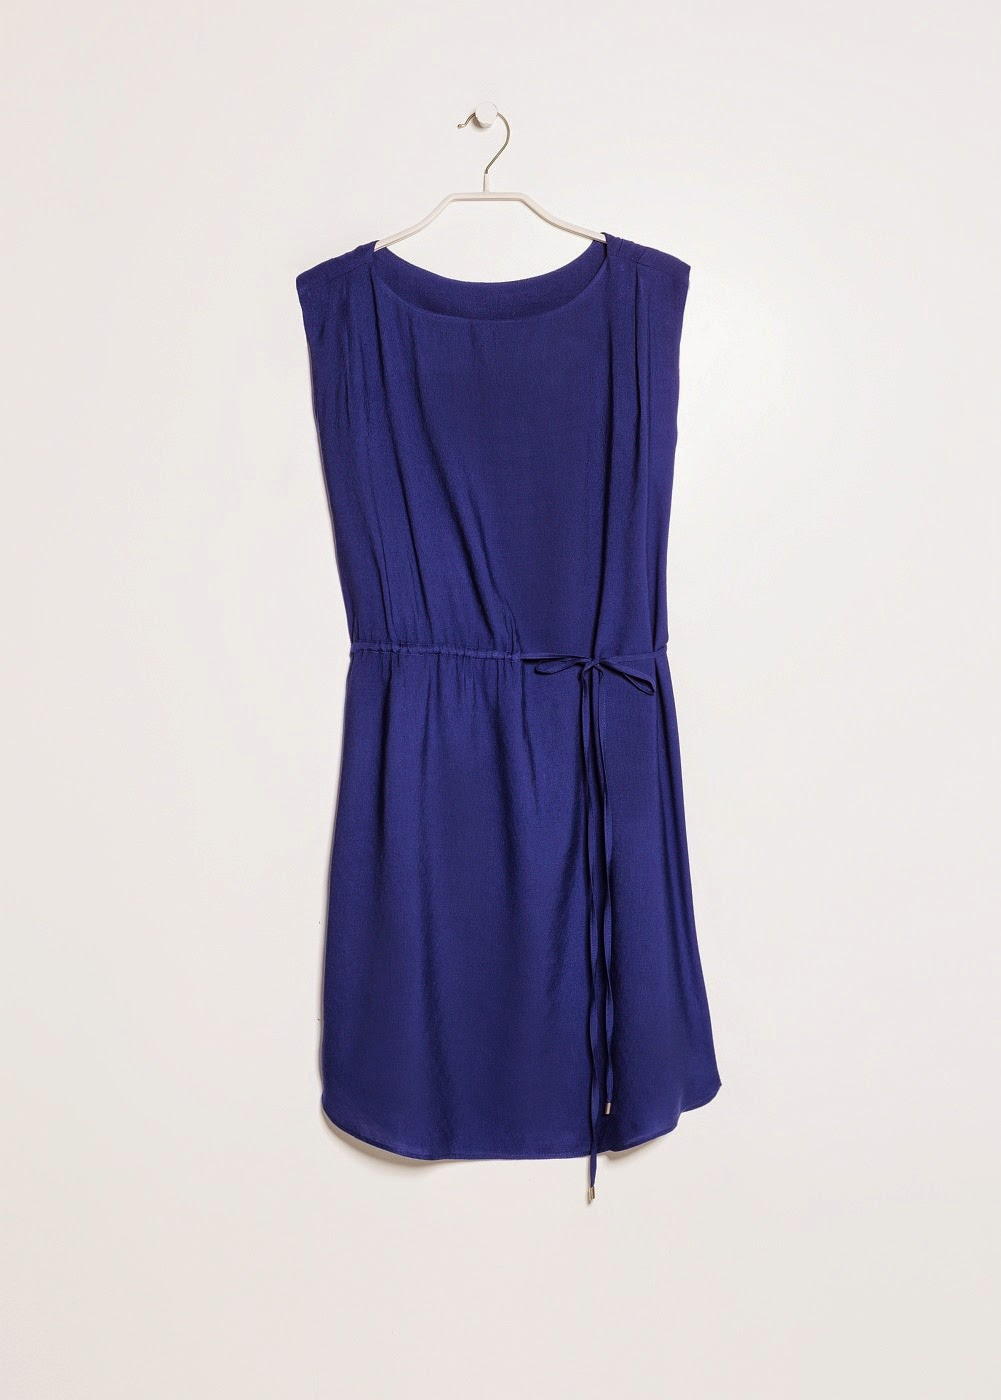 http://shop.mango.com/ES/p0/mujer/prendas/vestidos/vestido-cordon-cintura/?id=31050316_OW&n=1&s=prendas.vestidosprendas&ident=0_color10_0_1415688534191&ts=1415688534191